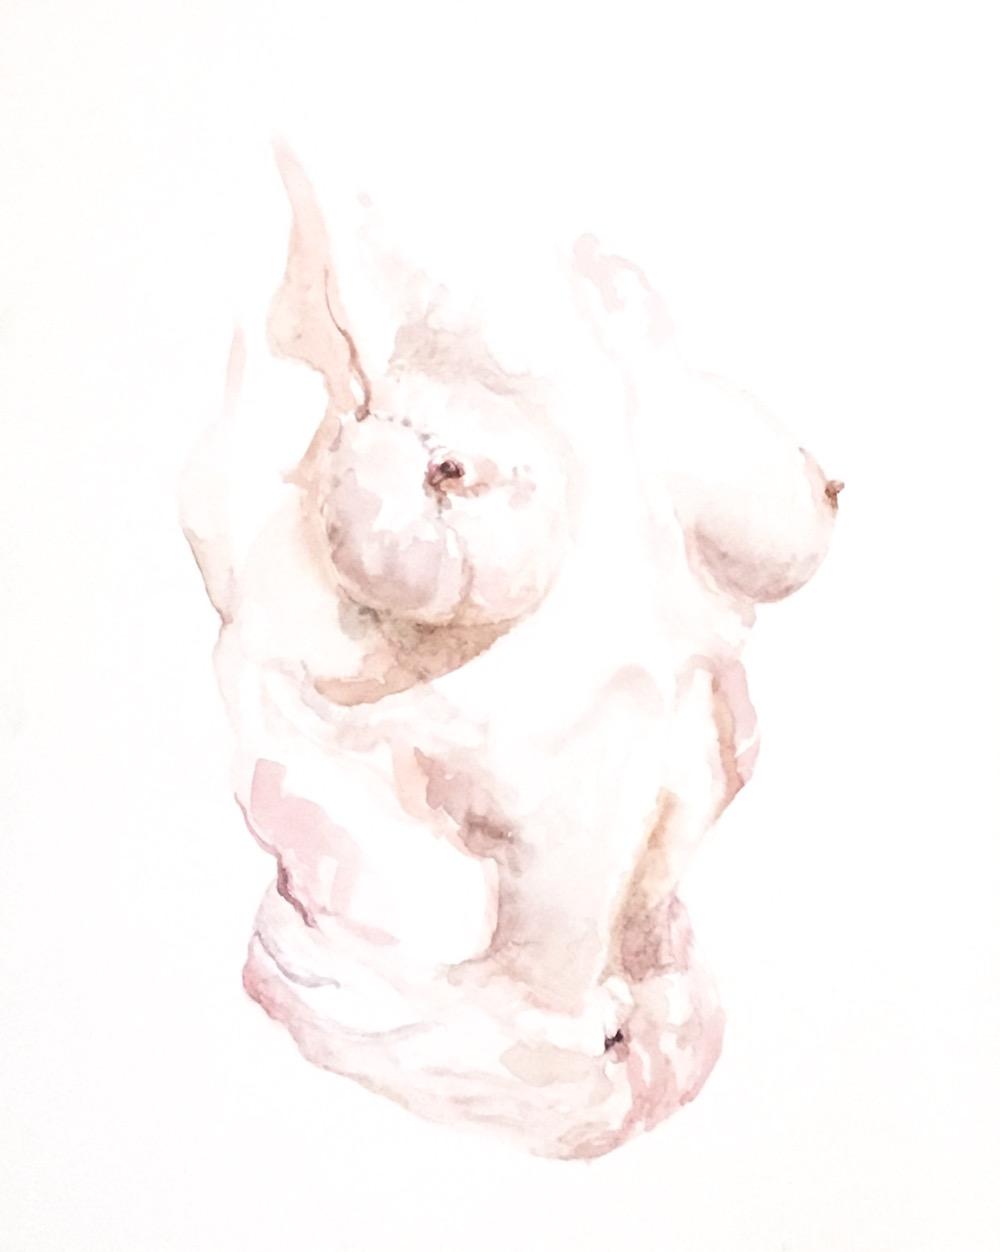 Tickled Pink by Fashion Illustration graduate Nina Miles Hilpern.